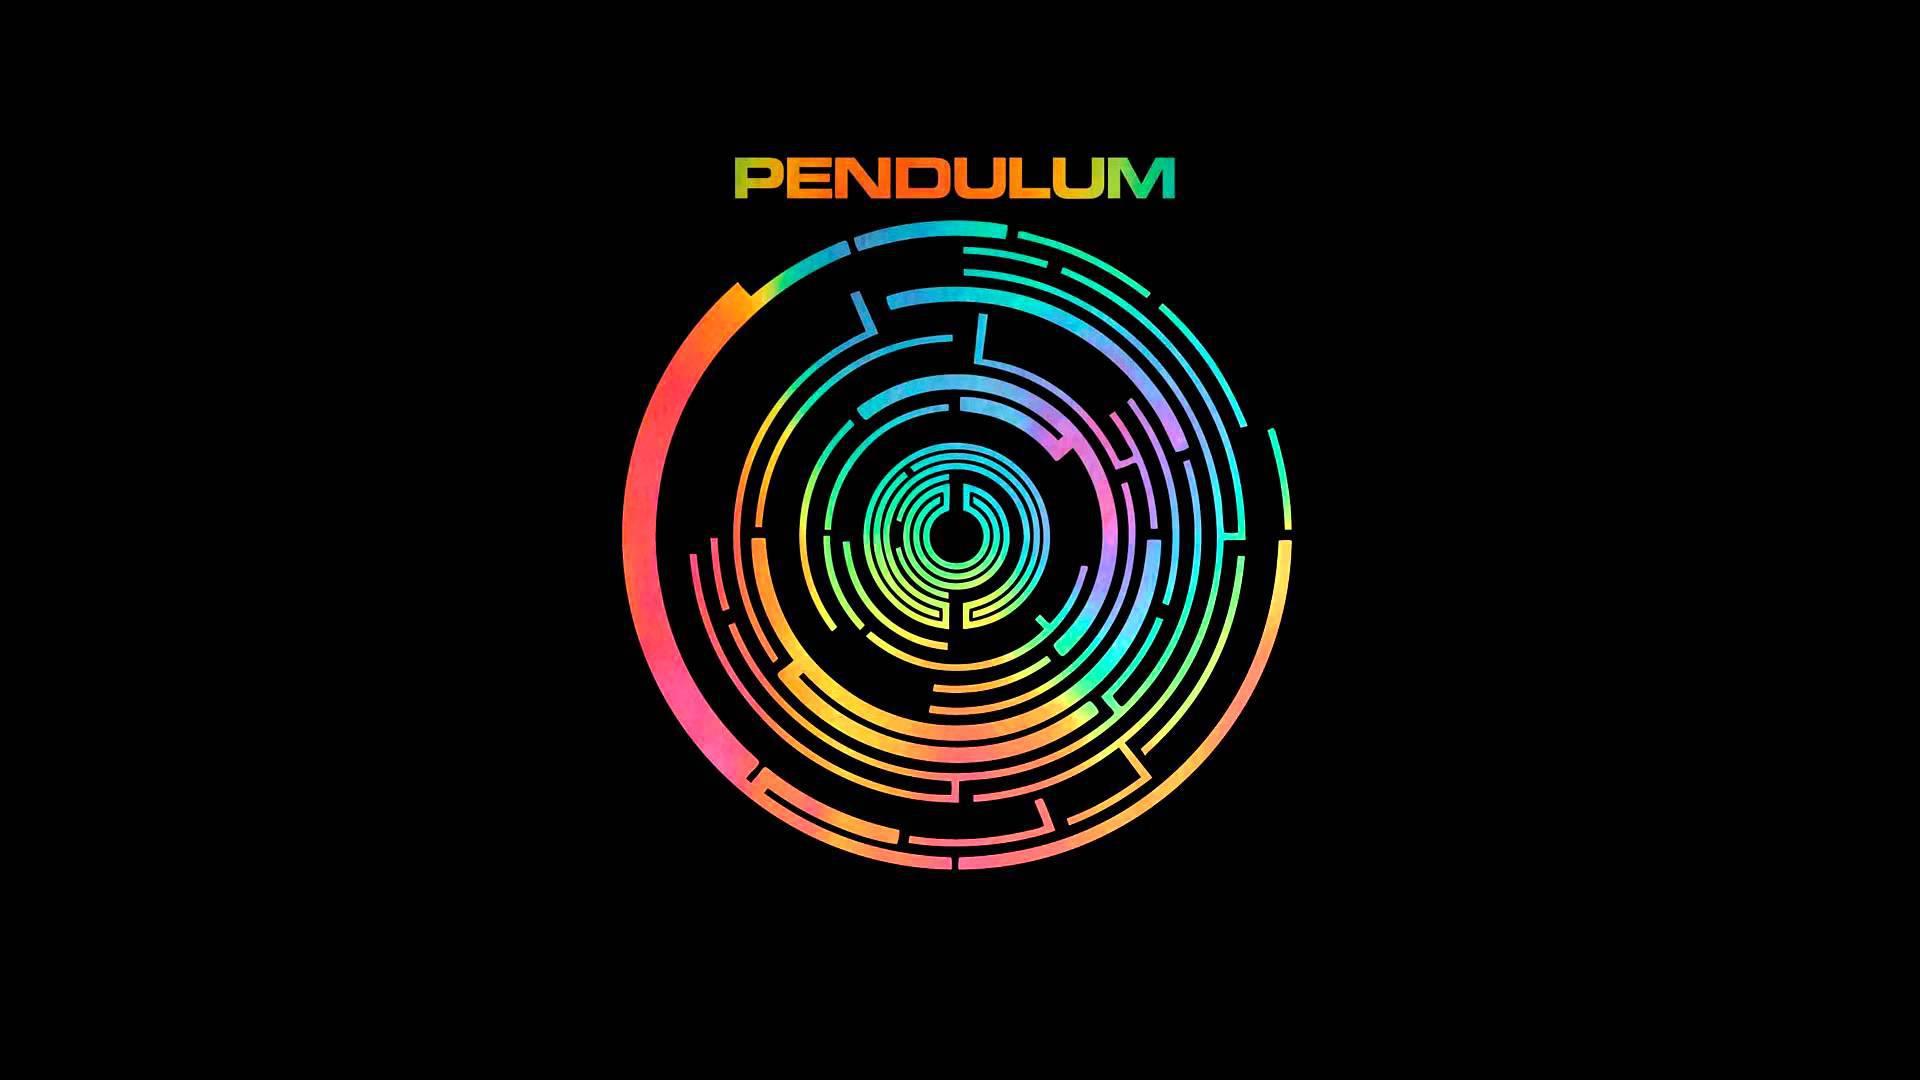 Pendulum Widescreen